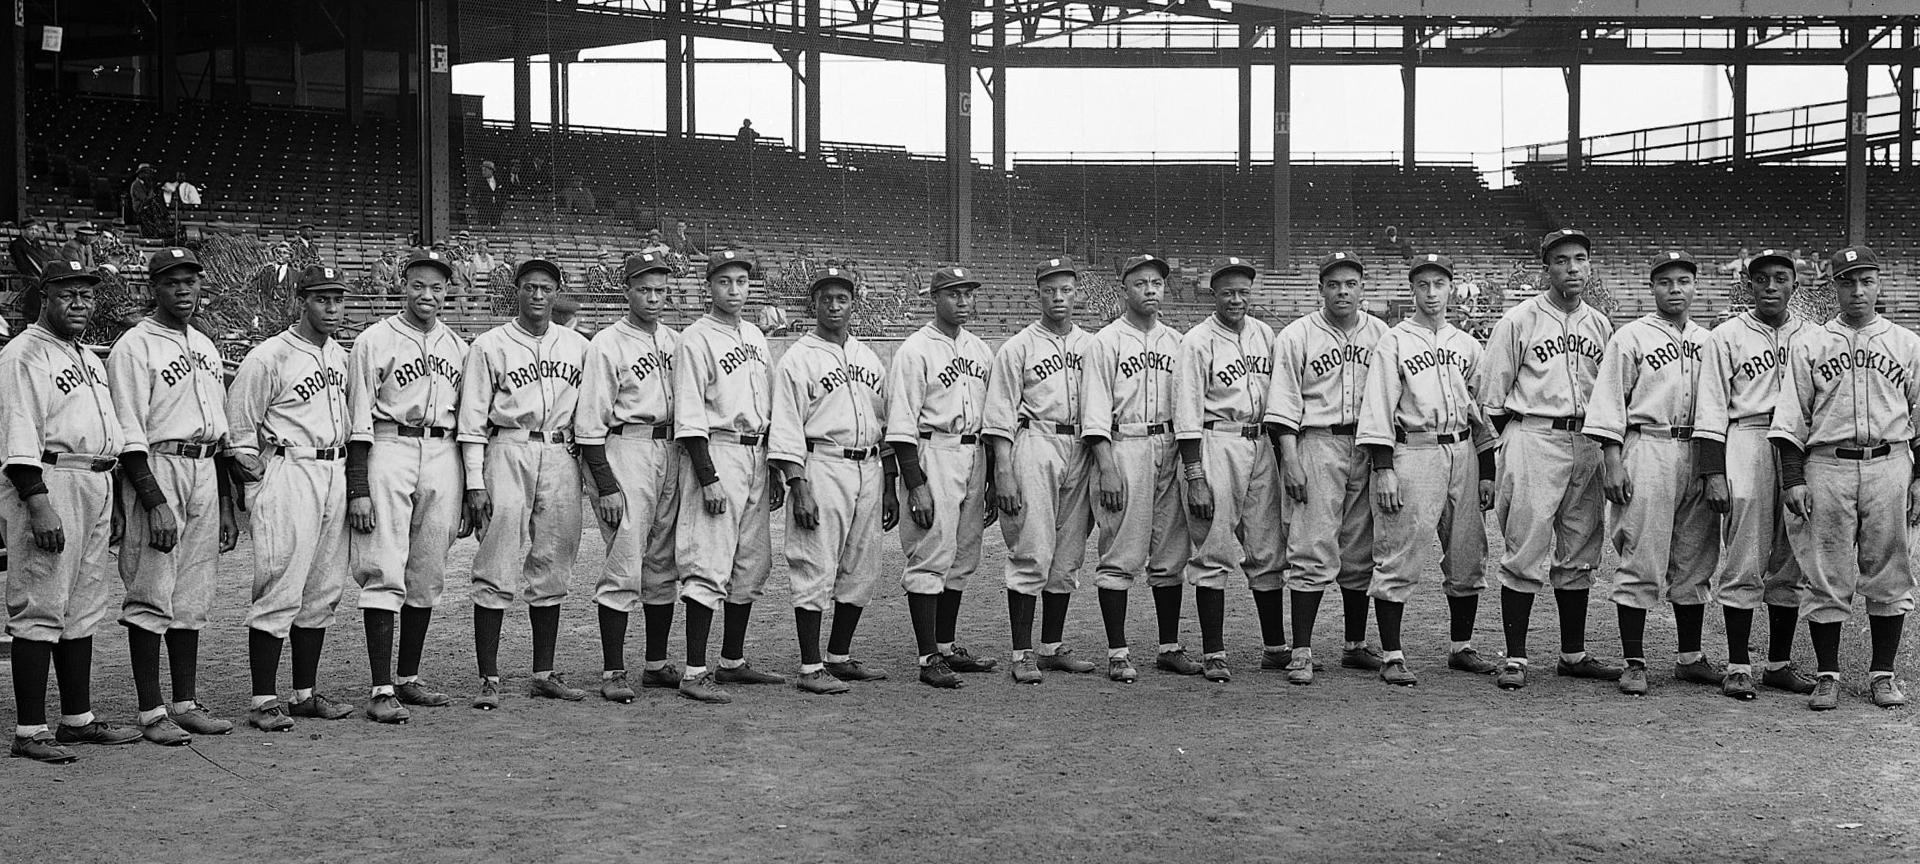 Baseball team lined up horizontally.